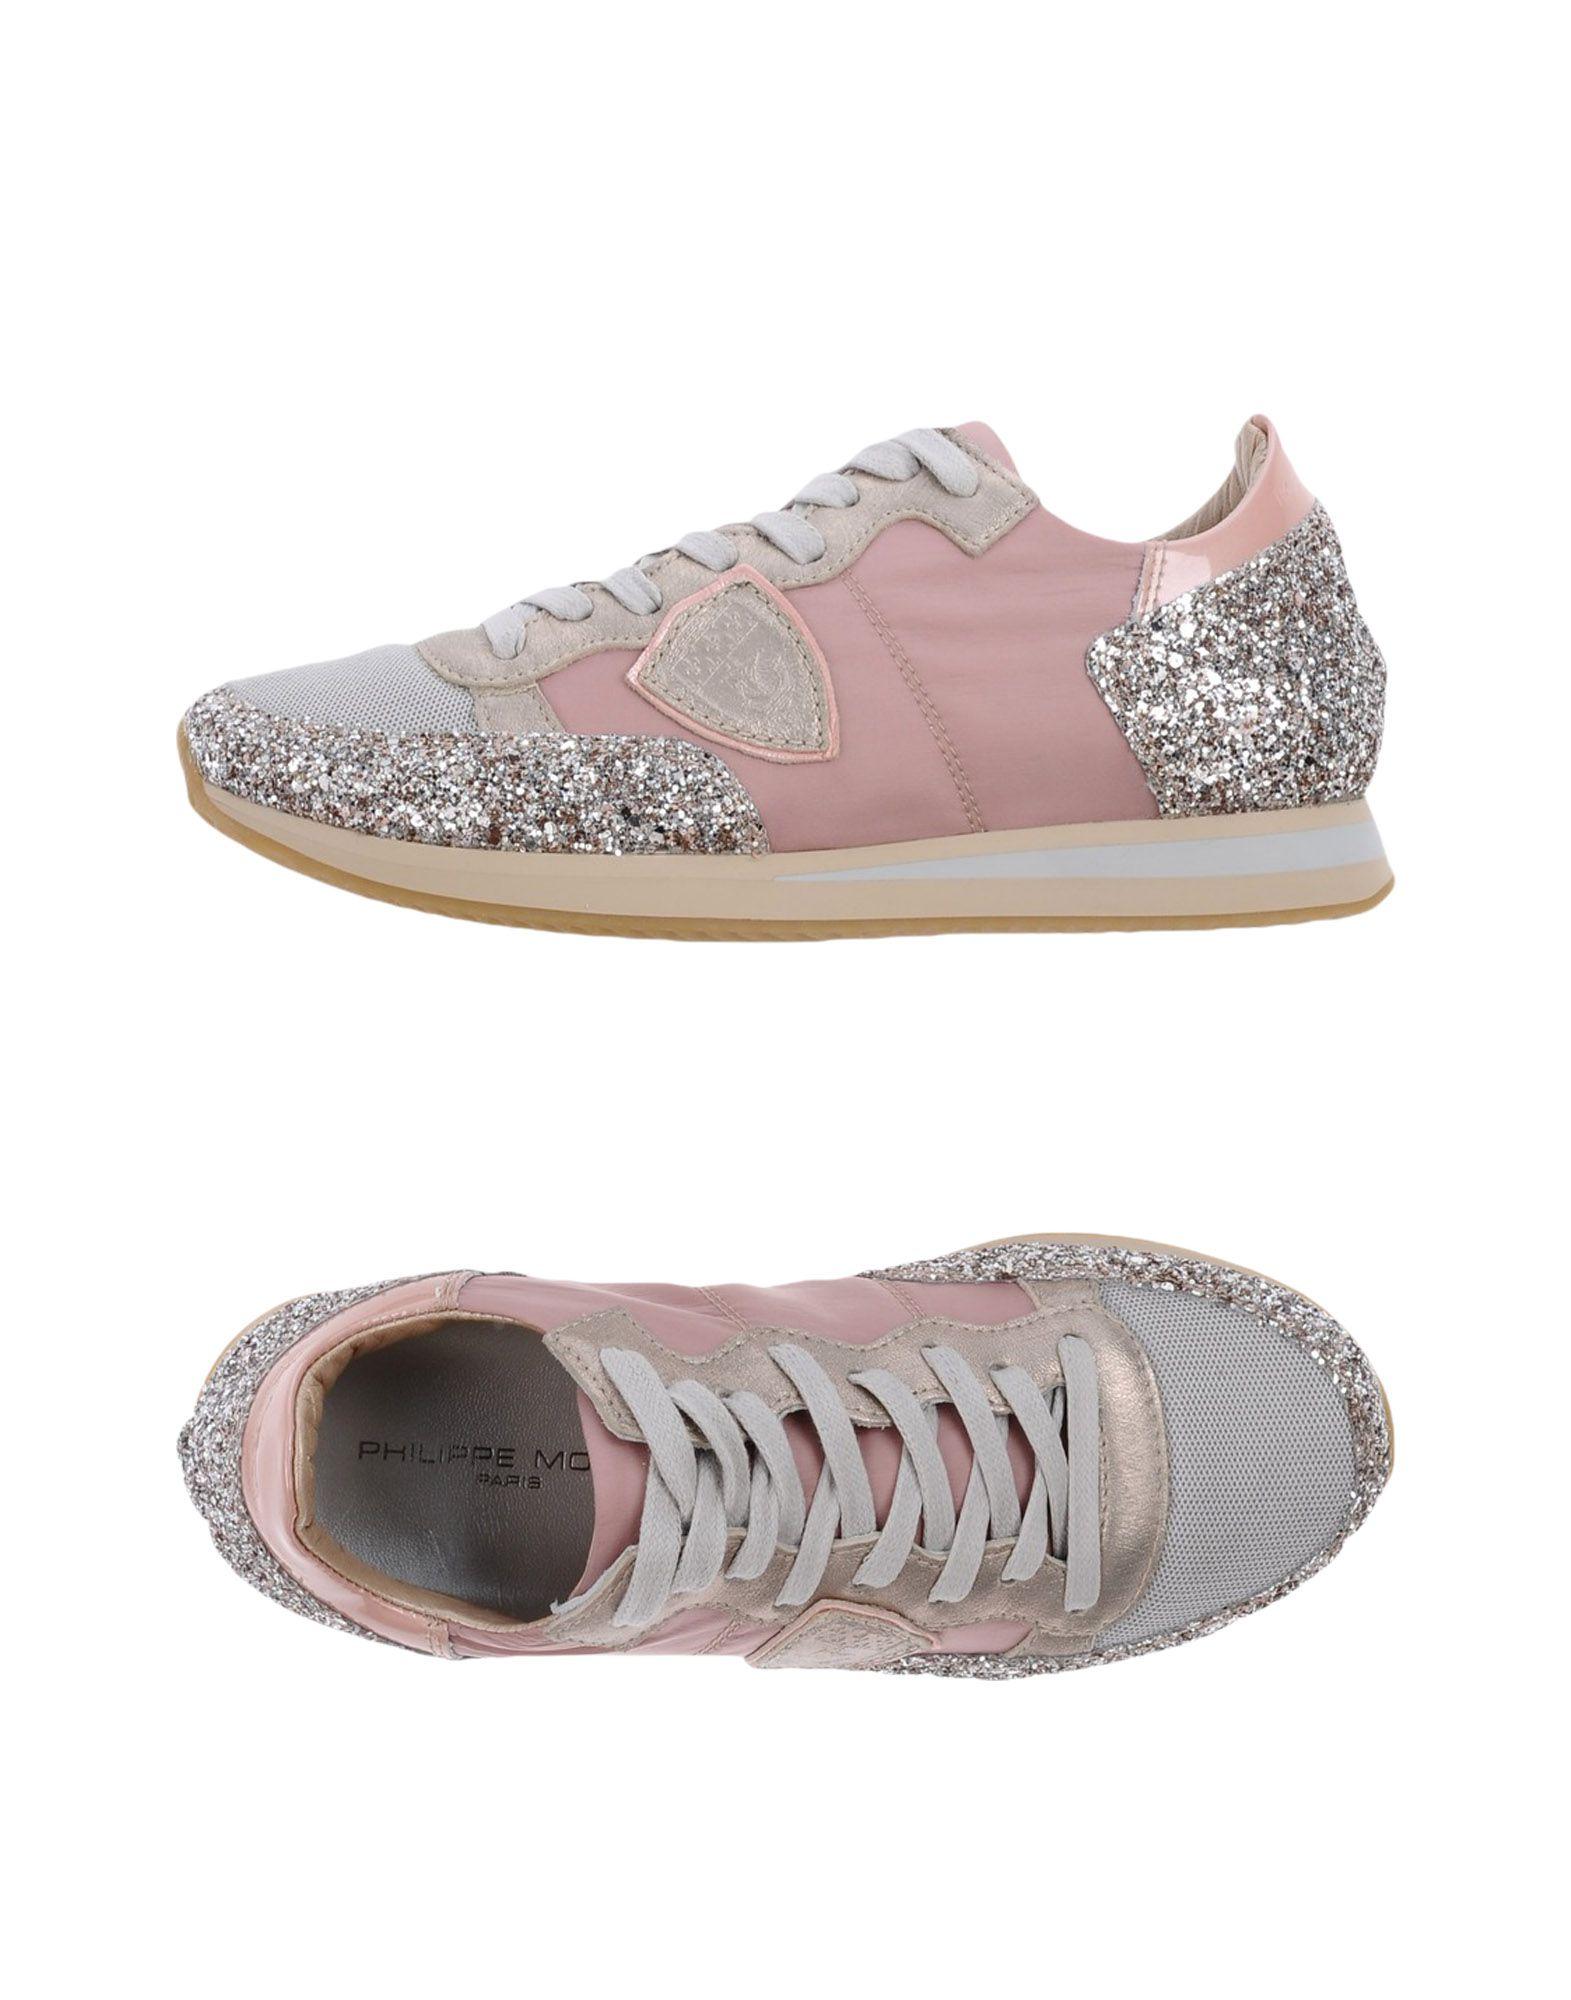 Philippe Model Sneakers Damen strapazierfähige  11360772FLGut aussehende strapazierfähige Damen Schuhe c505d6